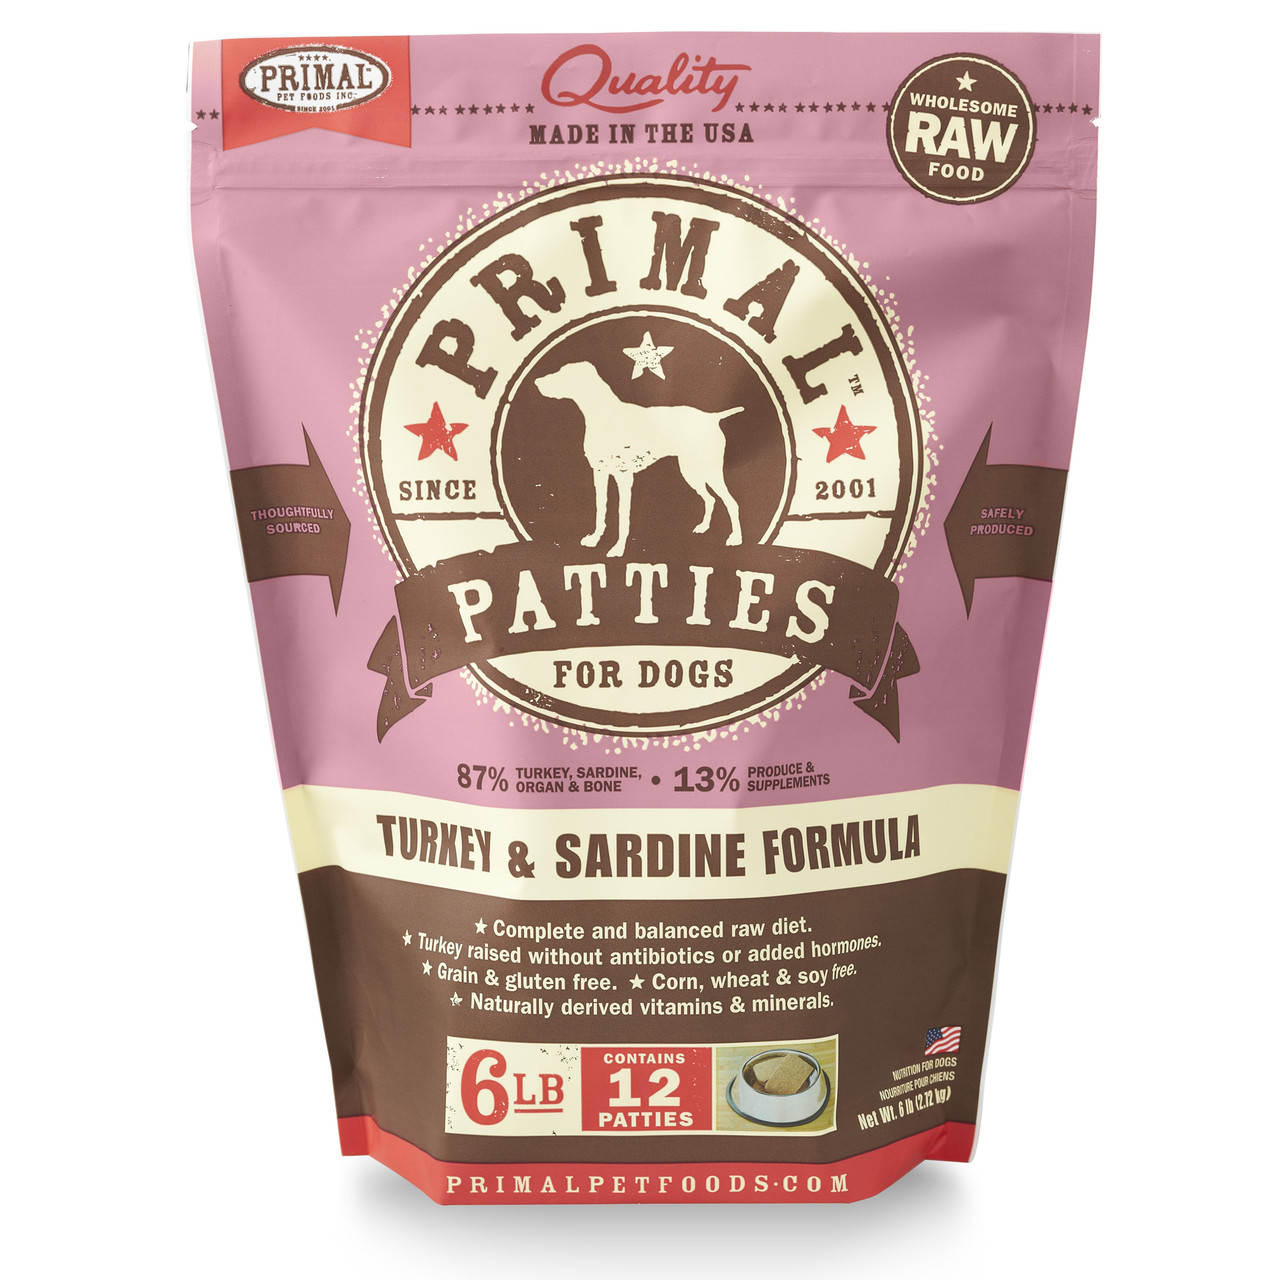 Primal Raw Frozen Canine Patties Turkey & Sardine Formula Dog Food